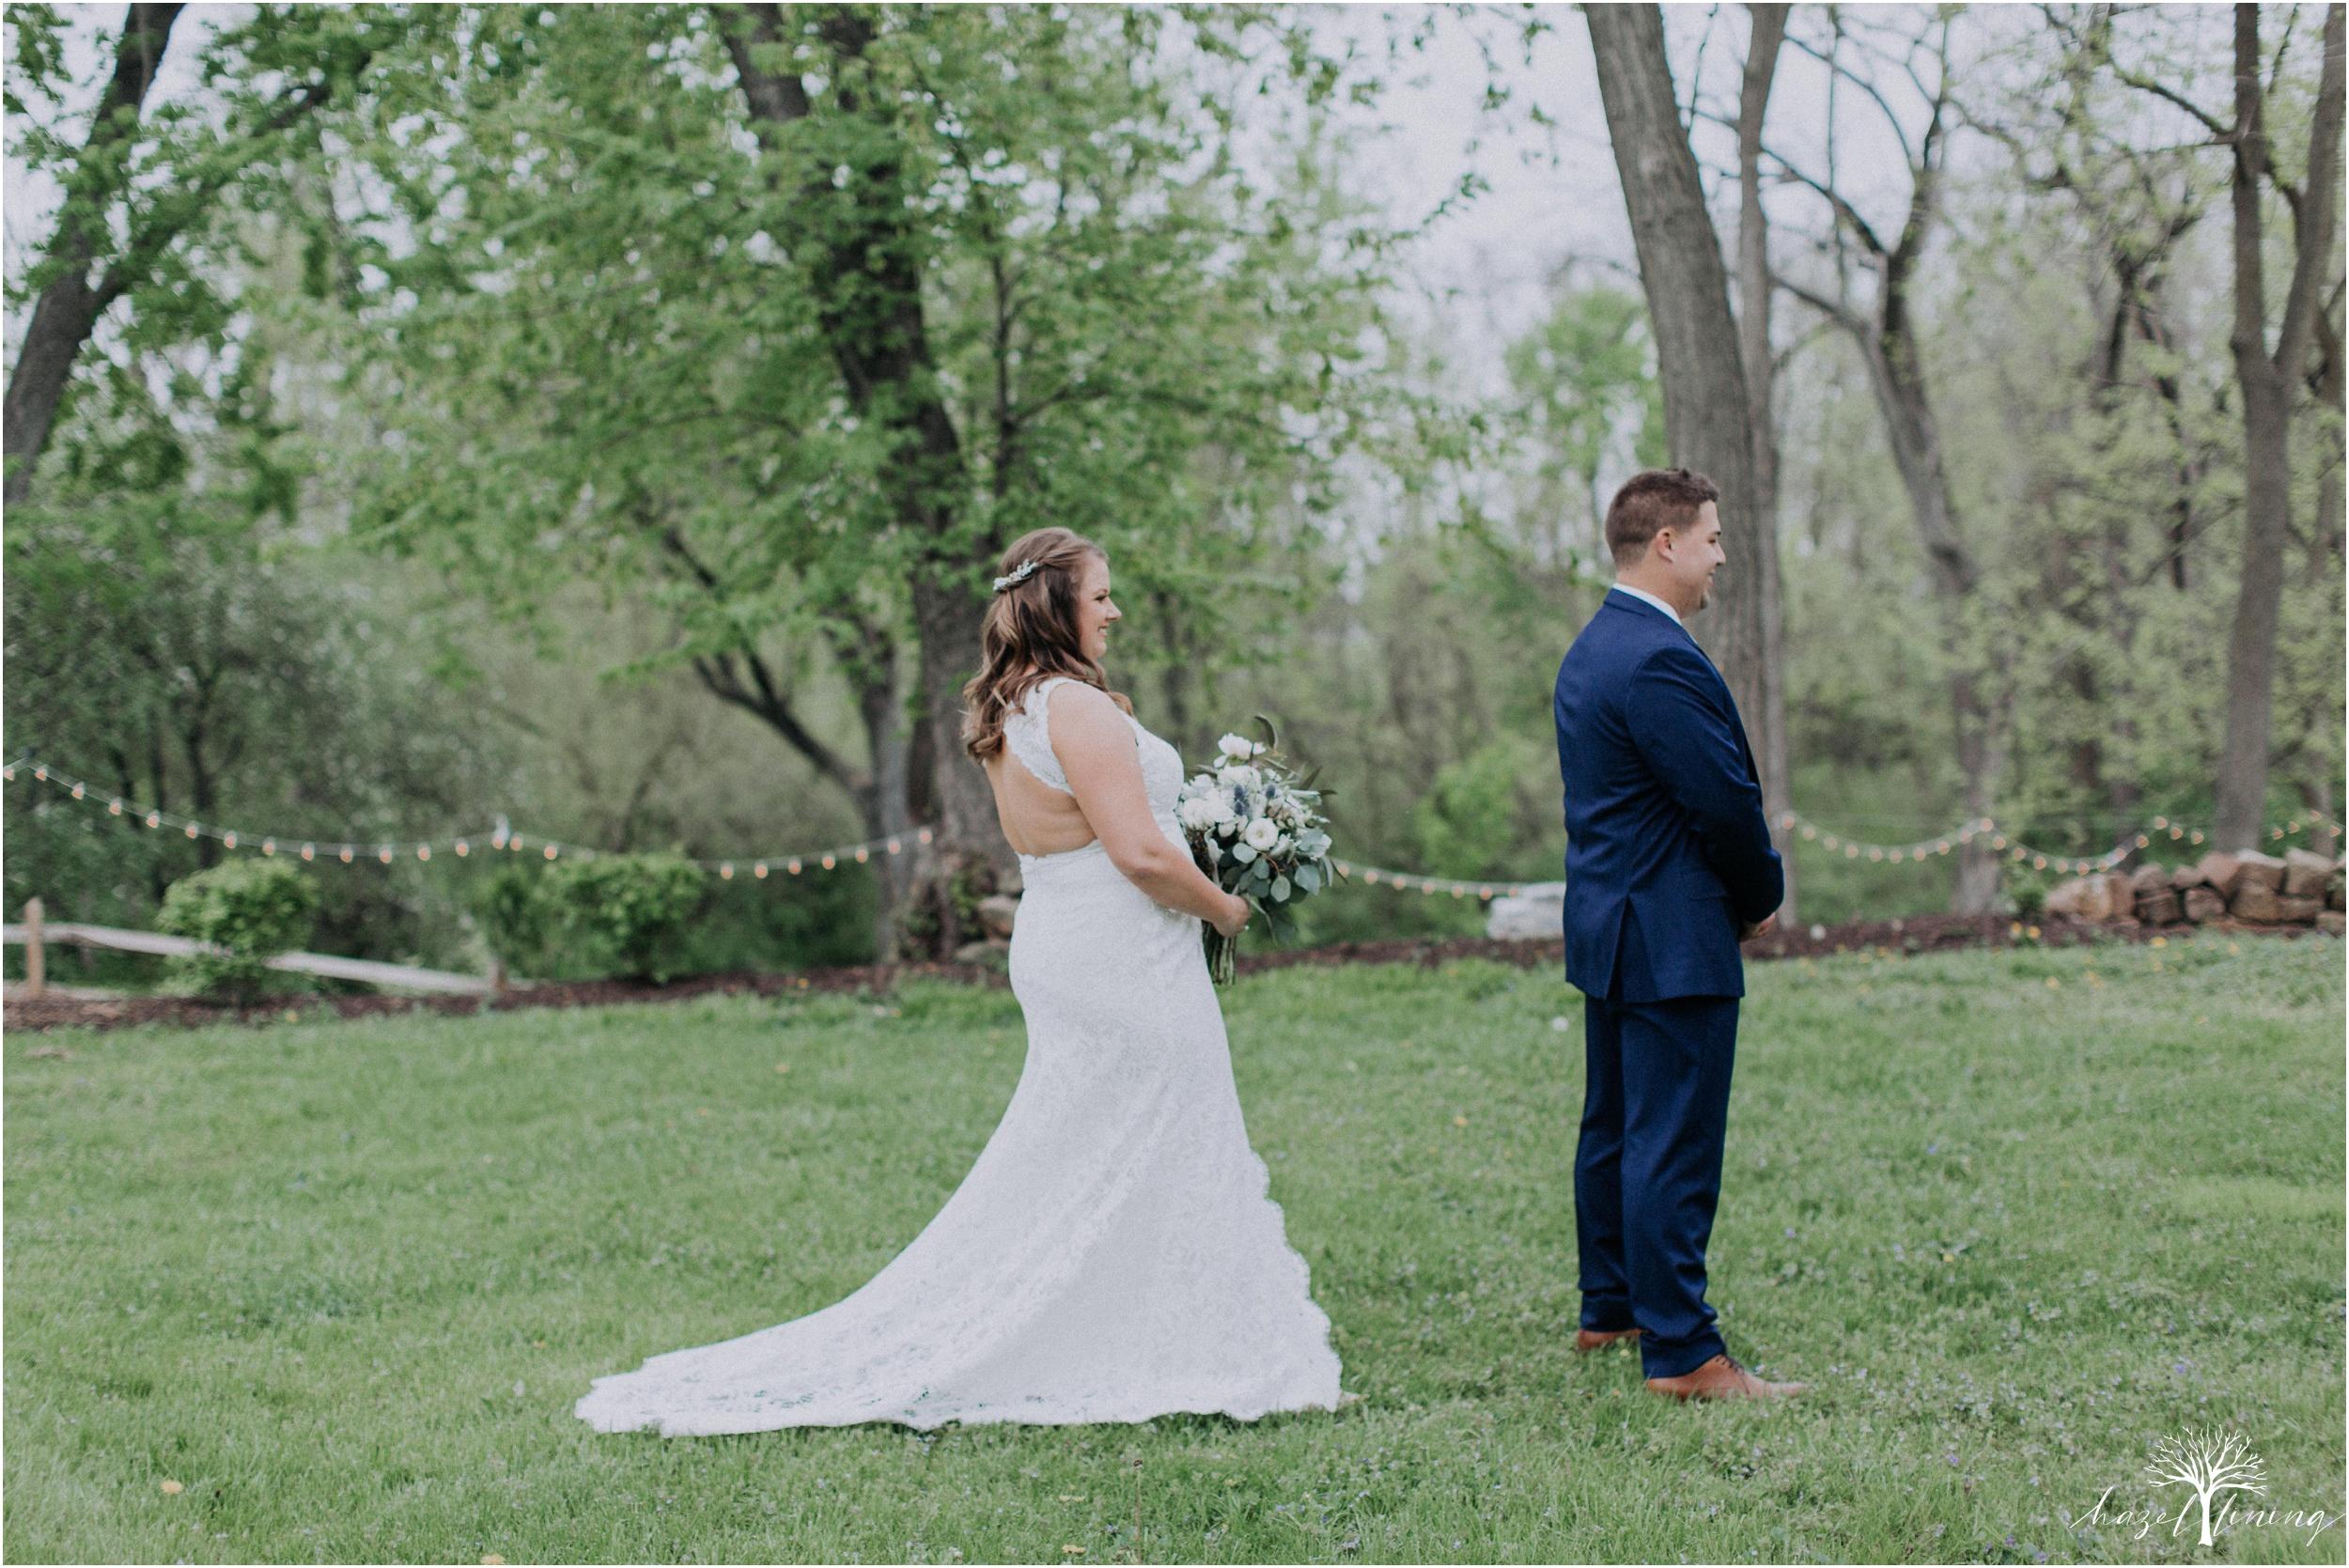 hazel-lining-travel-wedding-elopement-photography-abby-skyler-hunt-the-willis-house-york-pennsylvania-outdoor-estate-wedding_0021.jpg